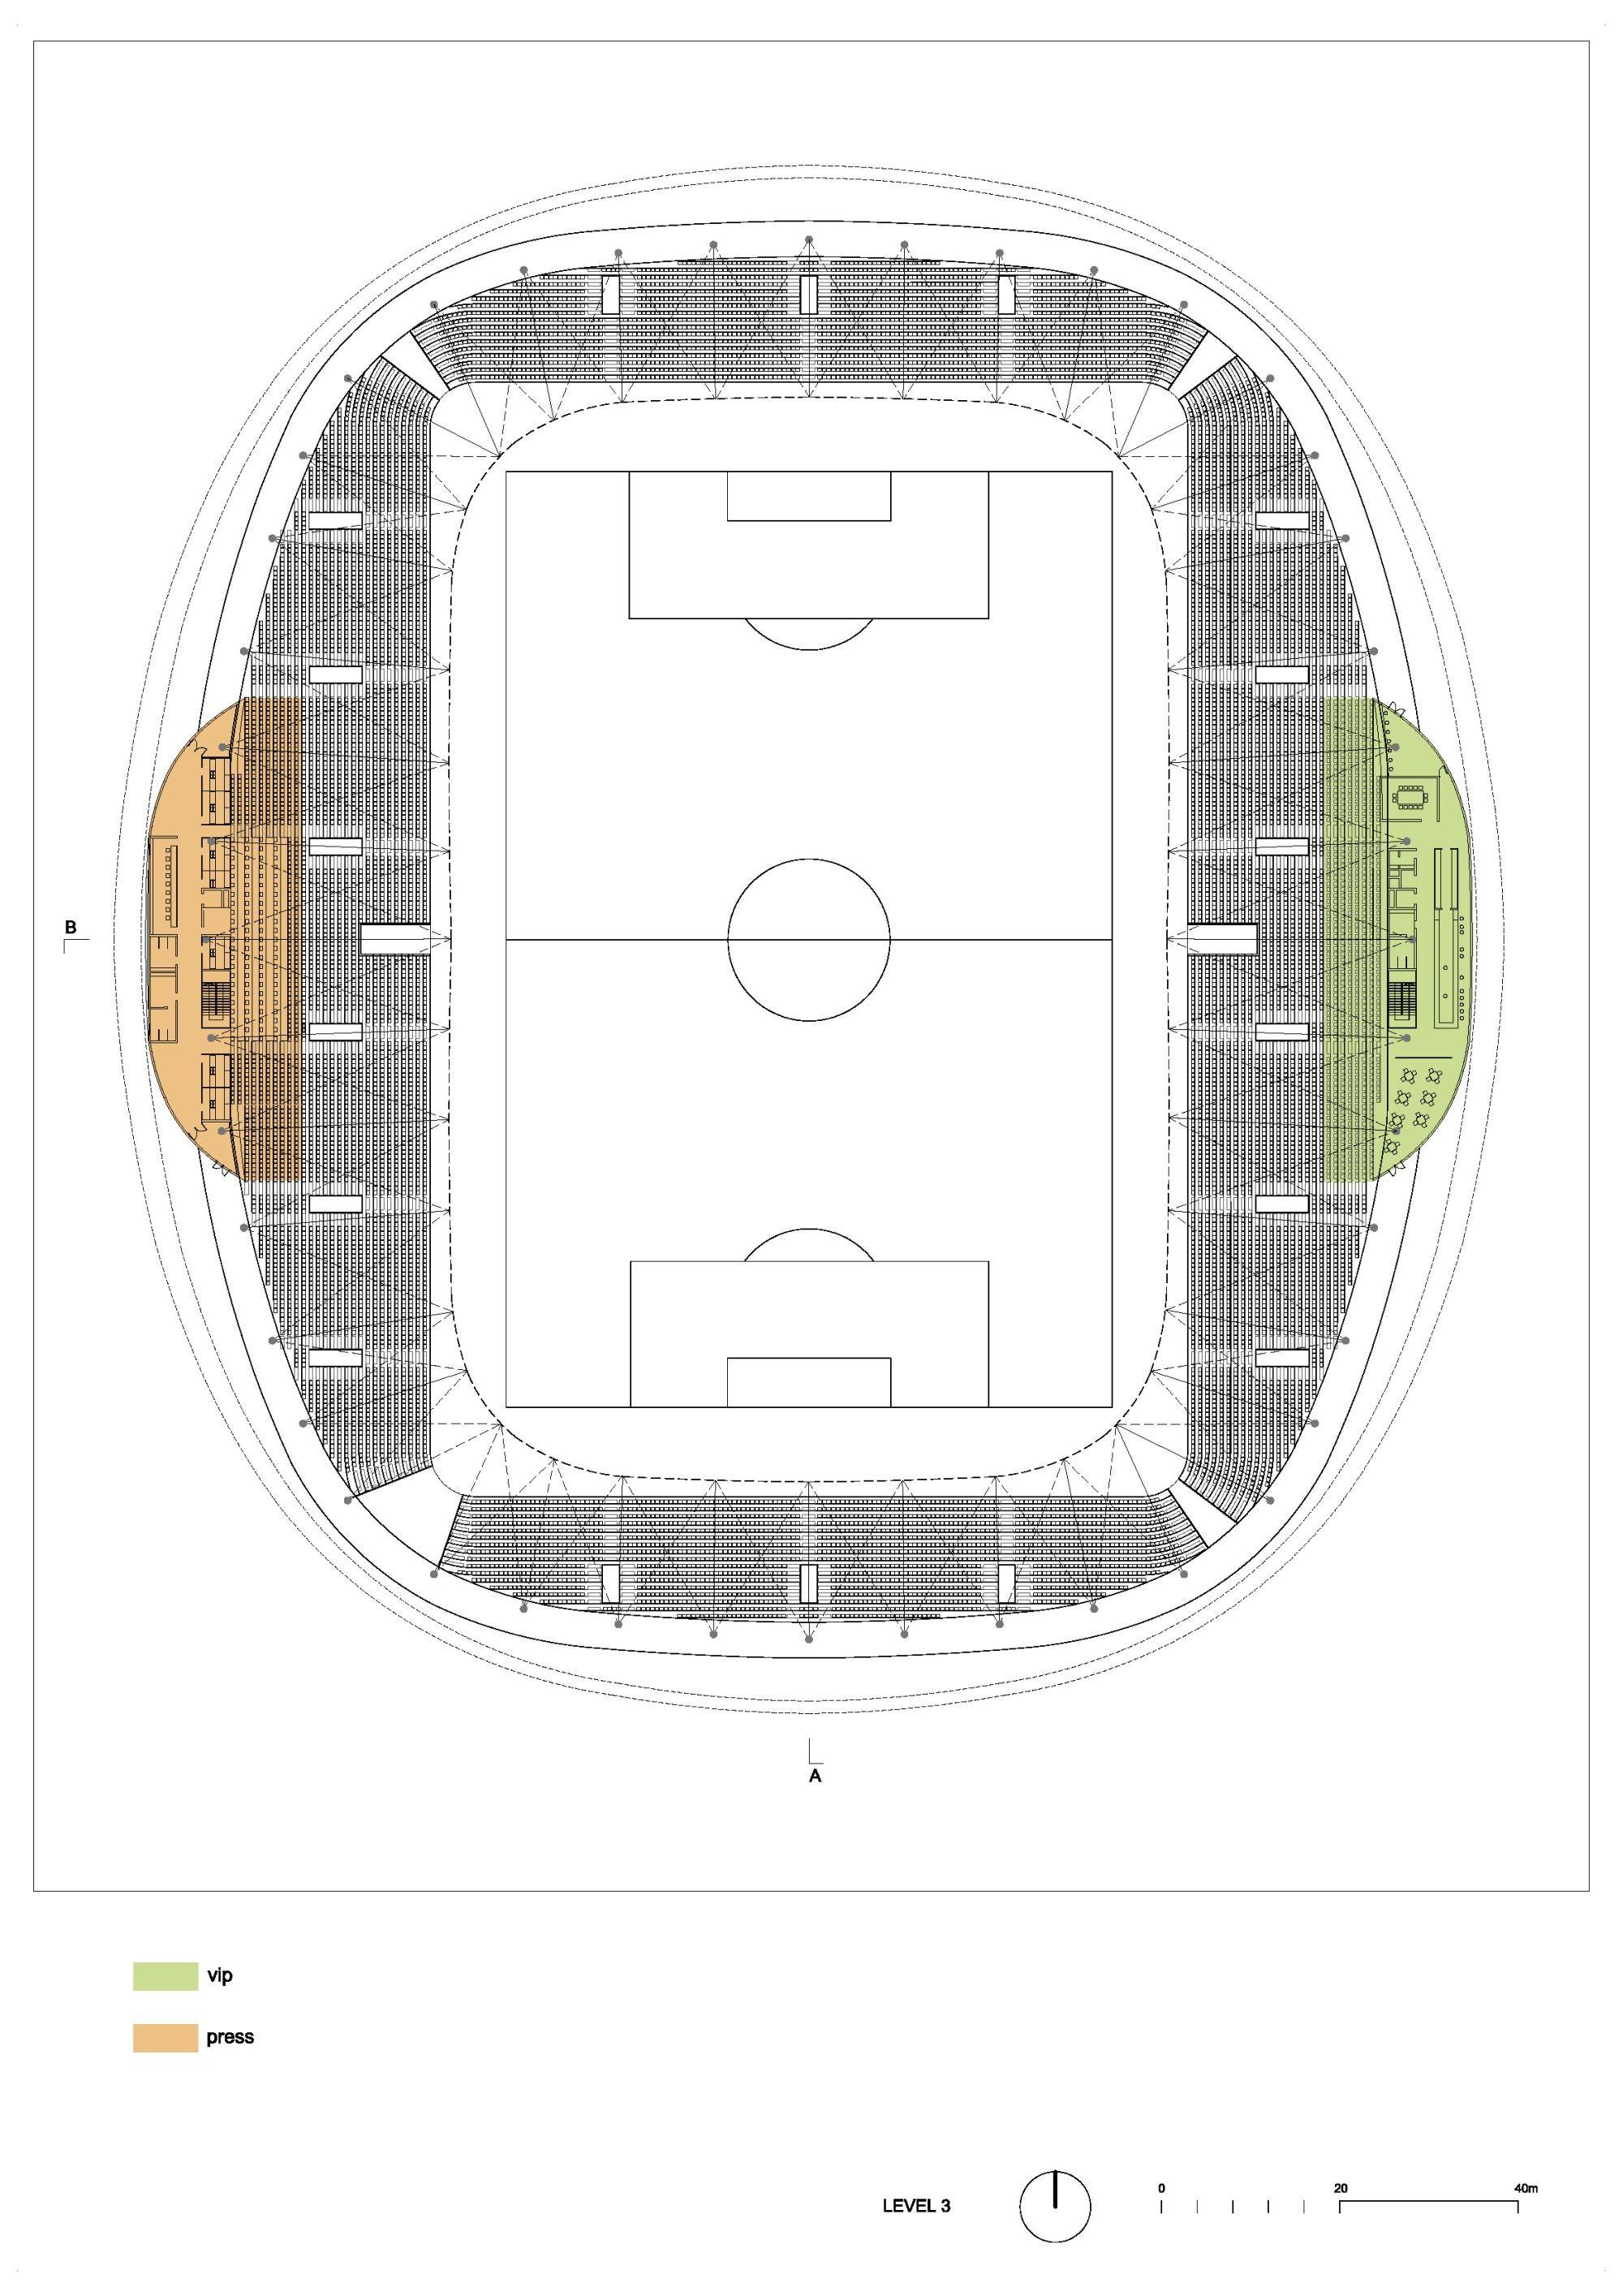 Details of secret Beckham stadium plan emerge: hotel, shops, offices, new park | Miami Herald